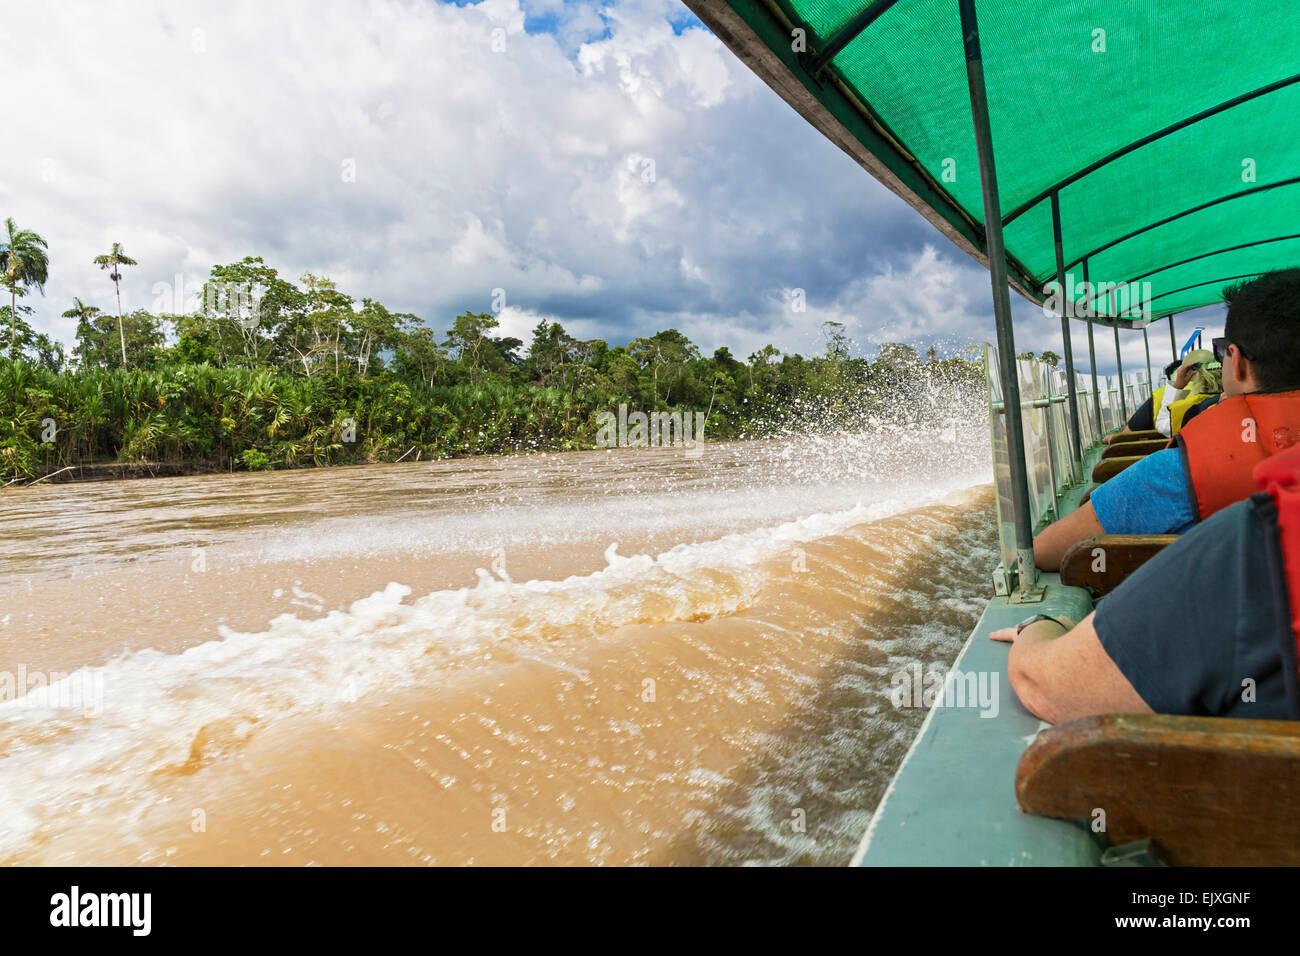 Ecuador, Amazon basin, tourist in longship on Rio Napo - Stock Image